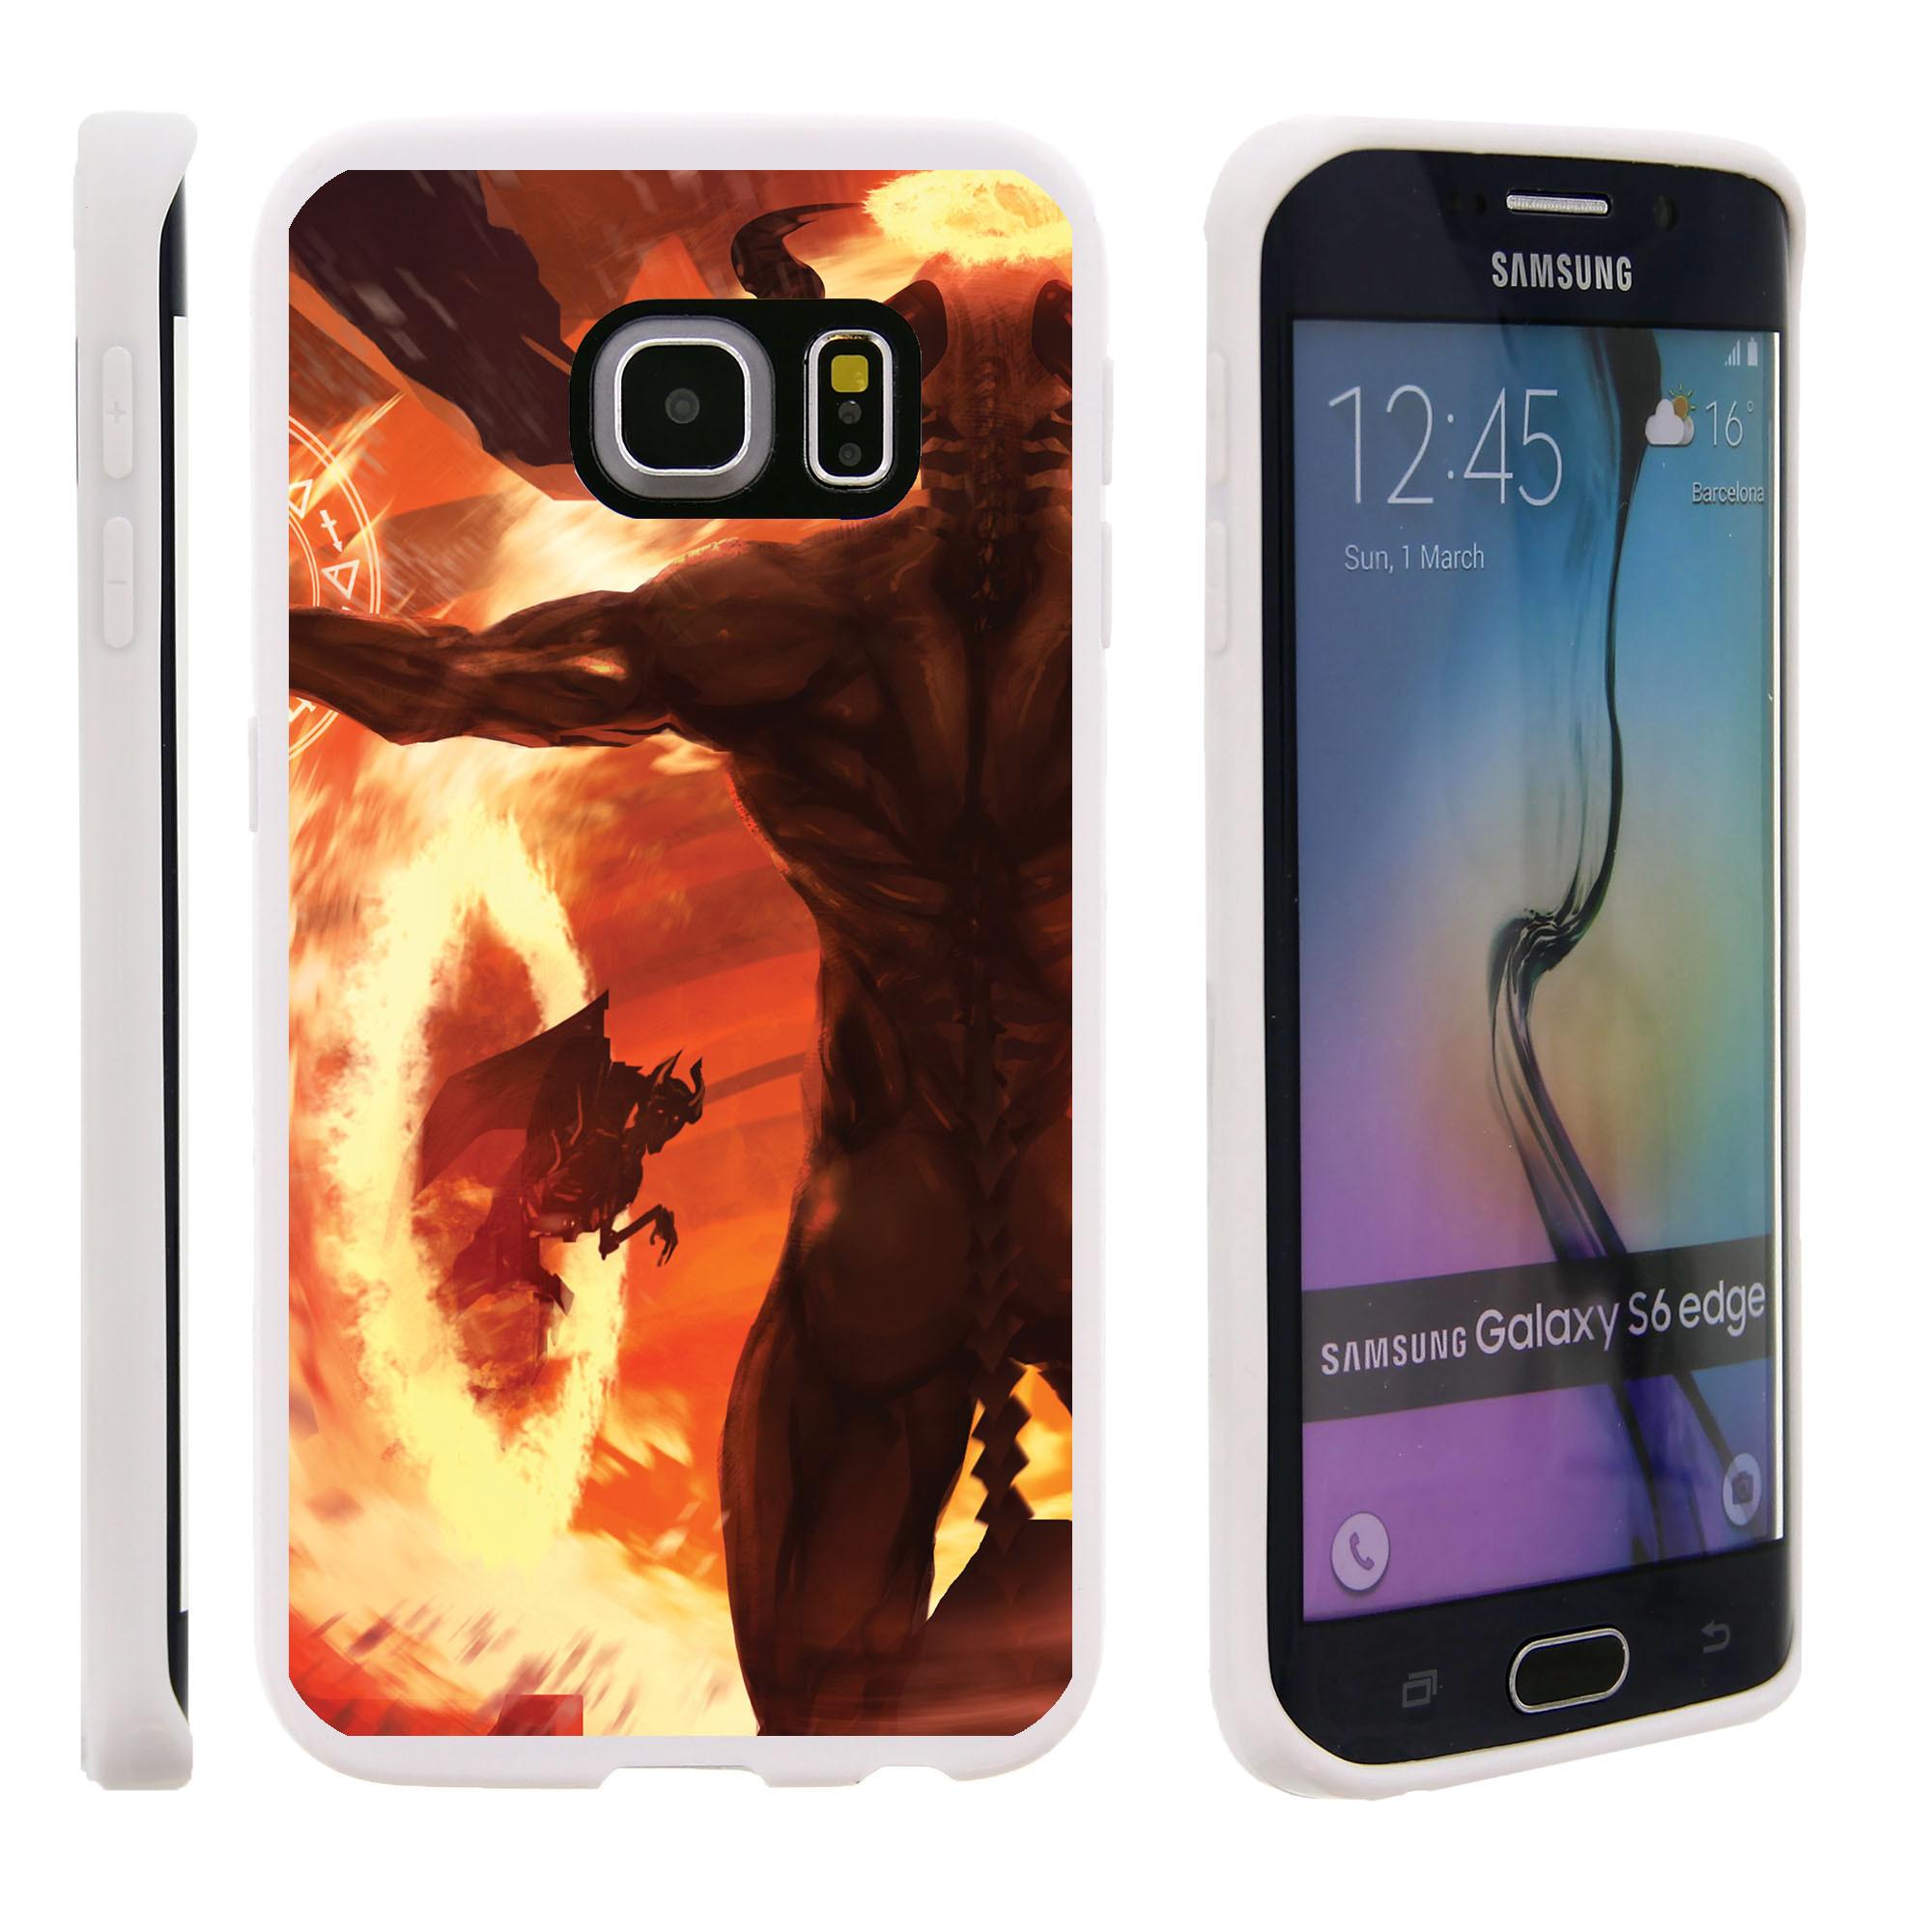 Samsung Galaxy S6 Edge G925, Flexible Case [FLEX FORCE] Slim Durable TPU Sleek Bumper with Unique Designs - Demons and Flames